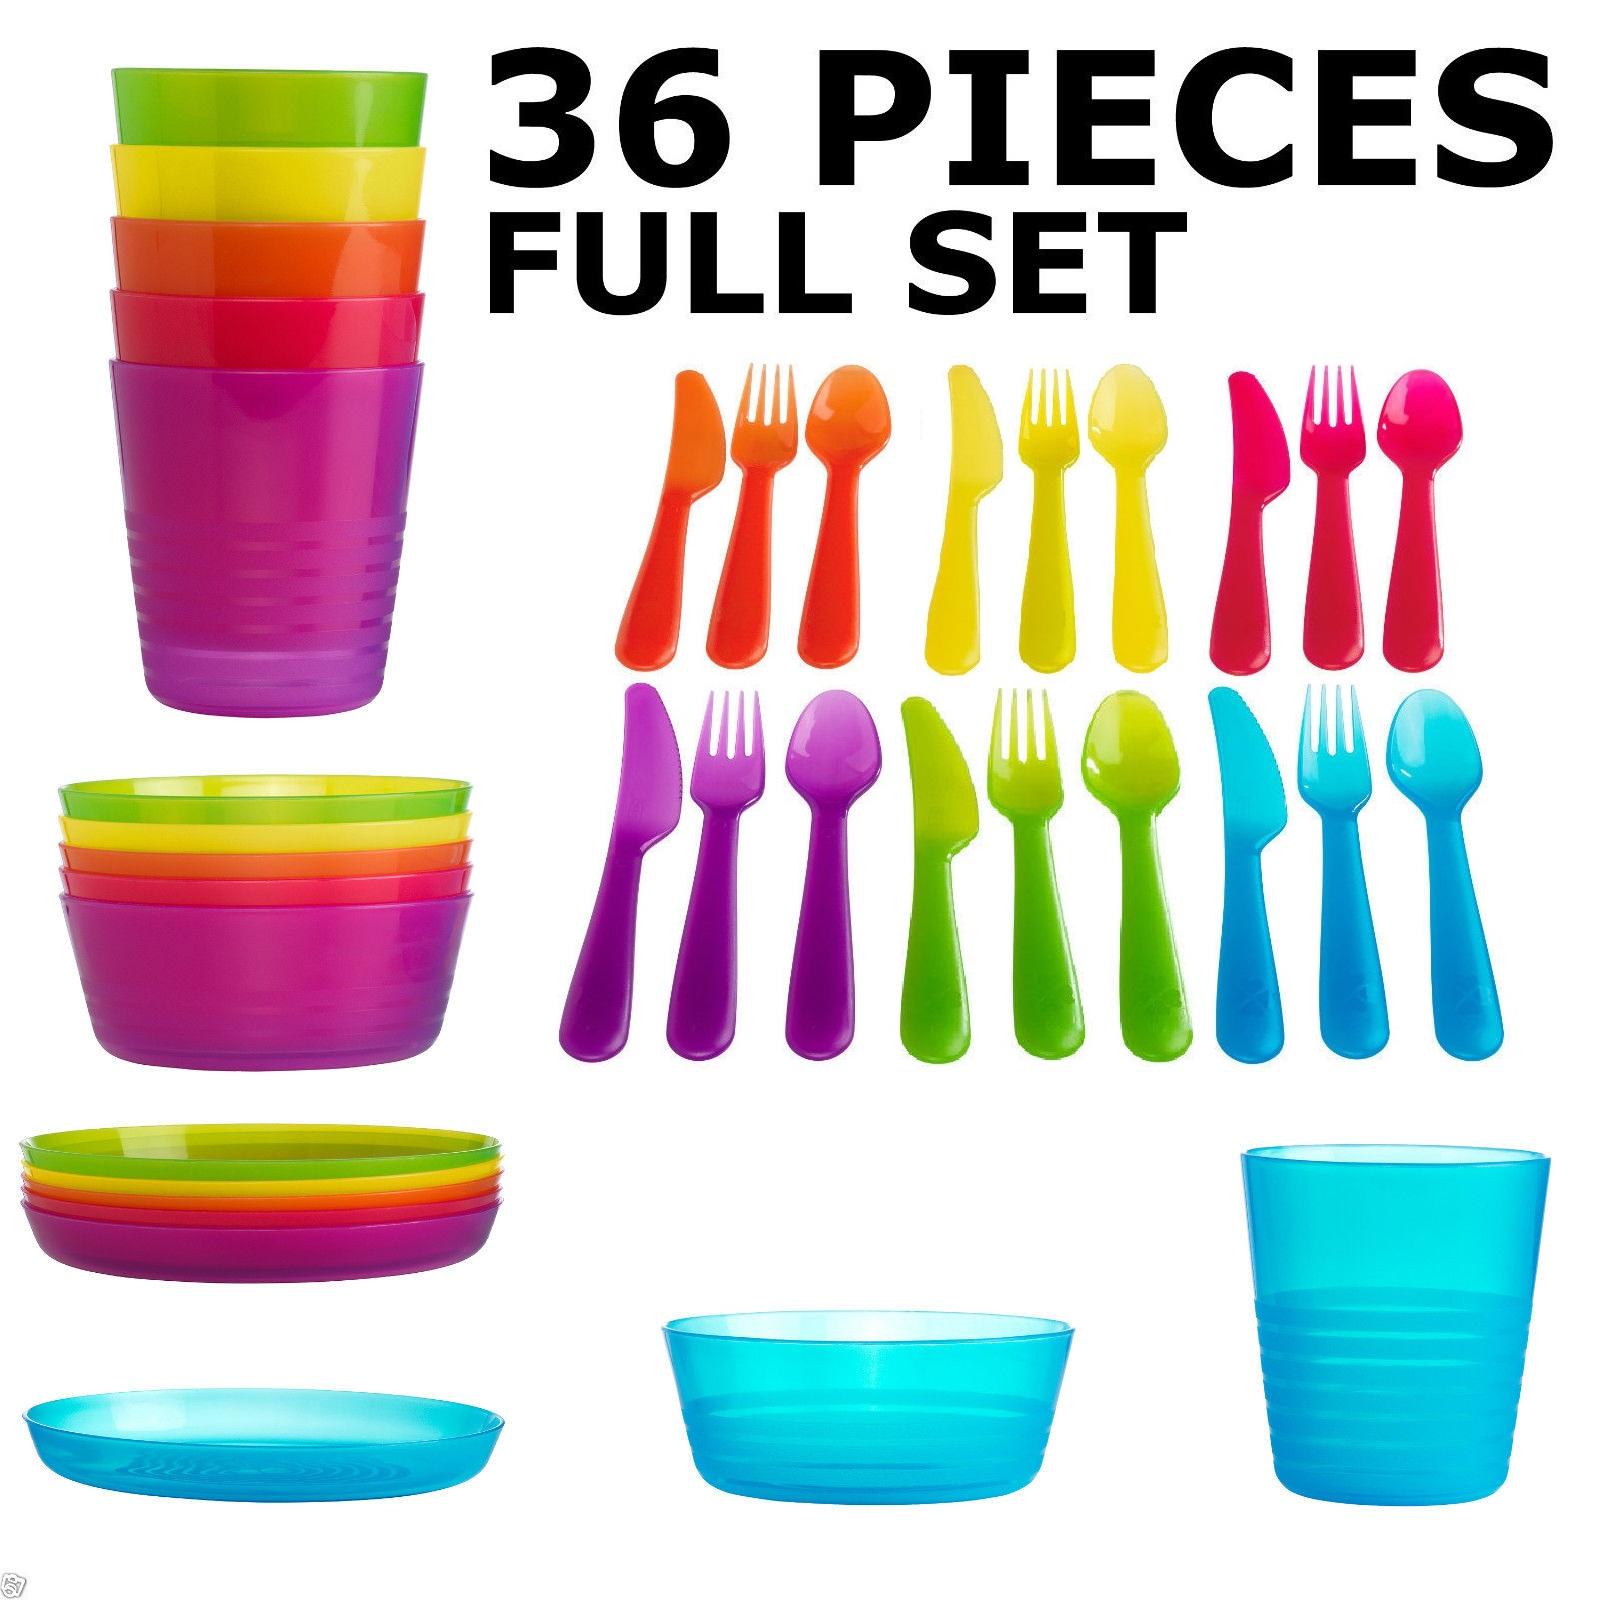 ikea kalas children 39 s plastic 36 piece cutlery set kids bowls plates cups ebay. Black Bedroom Furniture Sets. Home Design Ideas